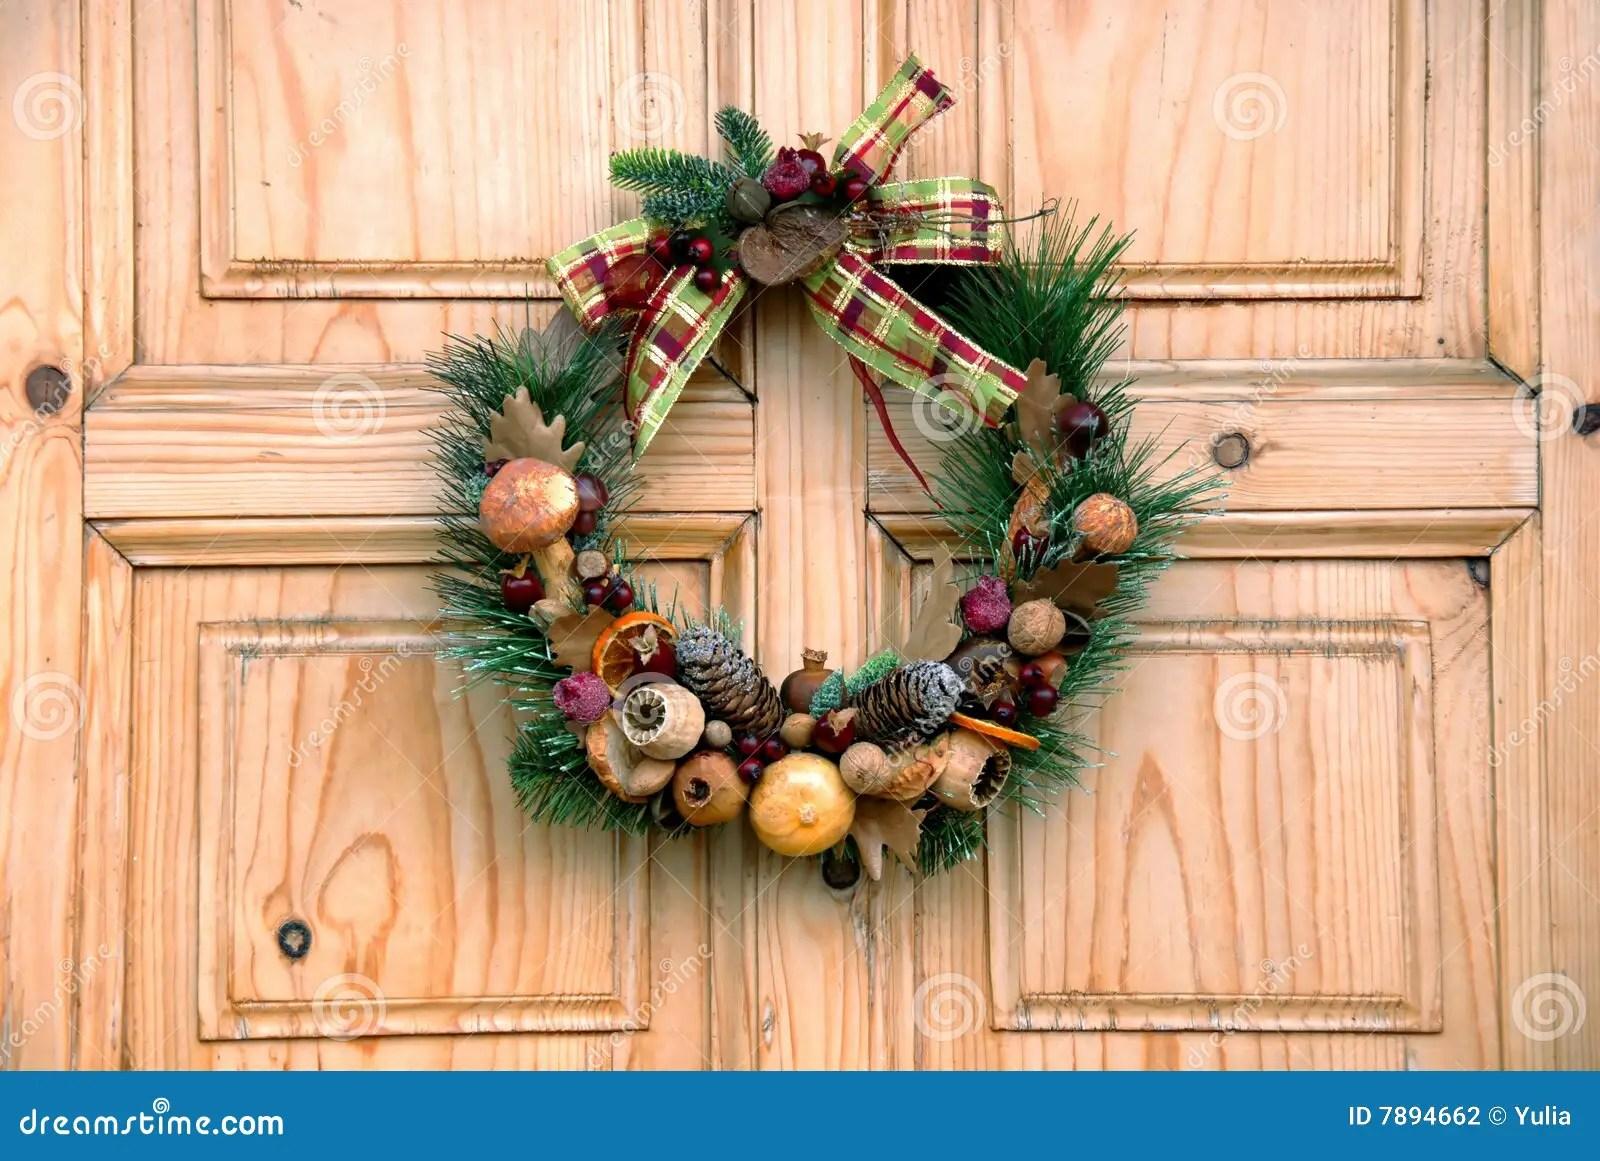 Christmas Door Decoration Stock Photography